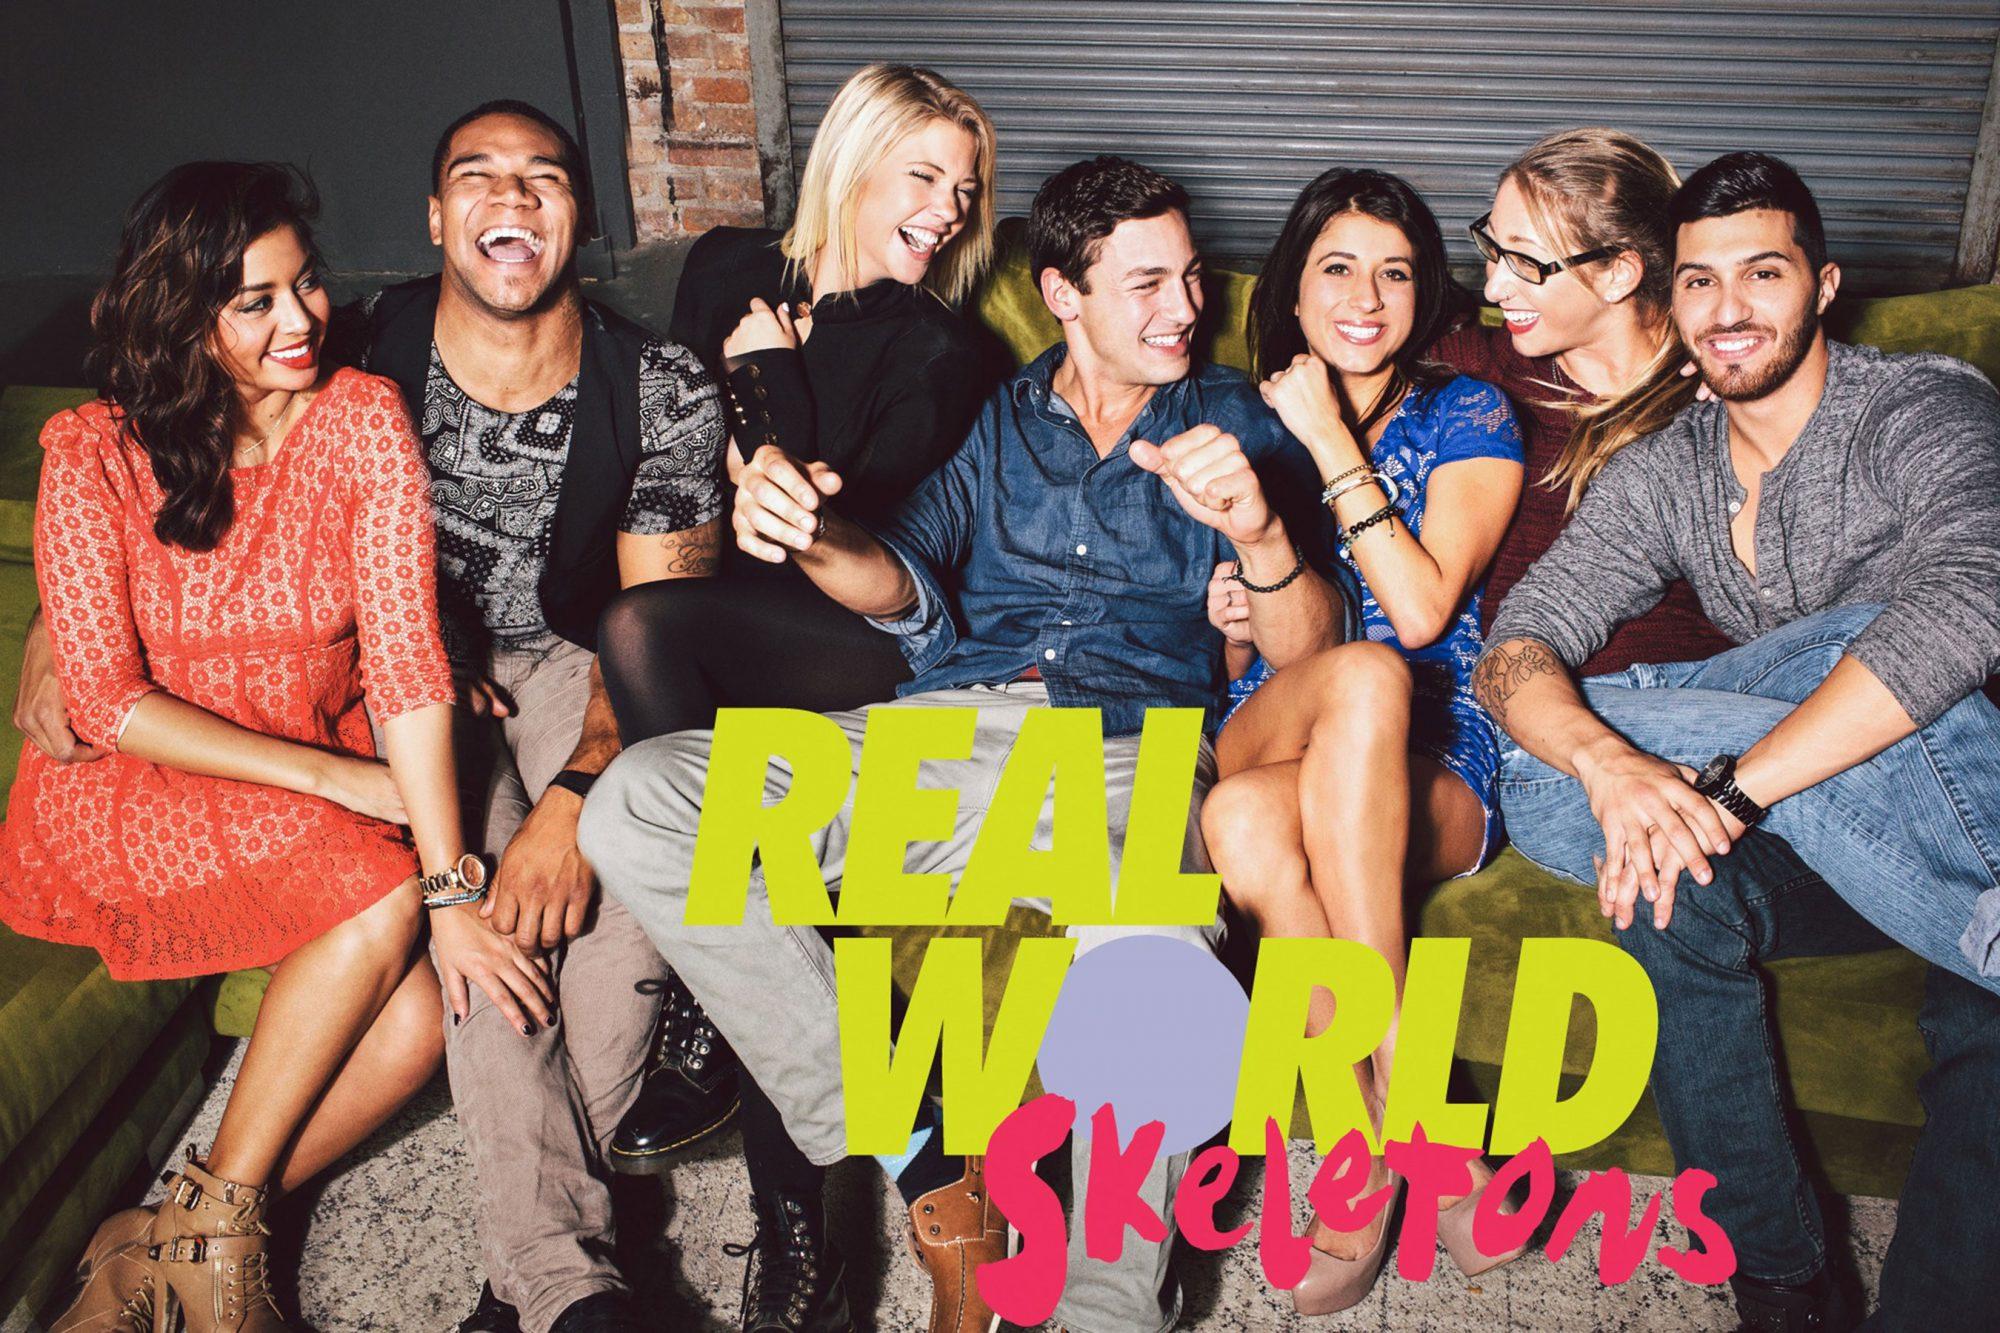 REAL WORLD Skeletons promo shot